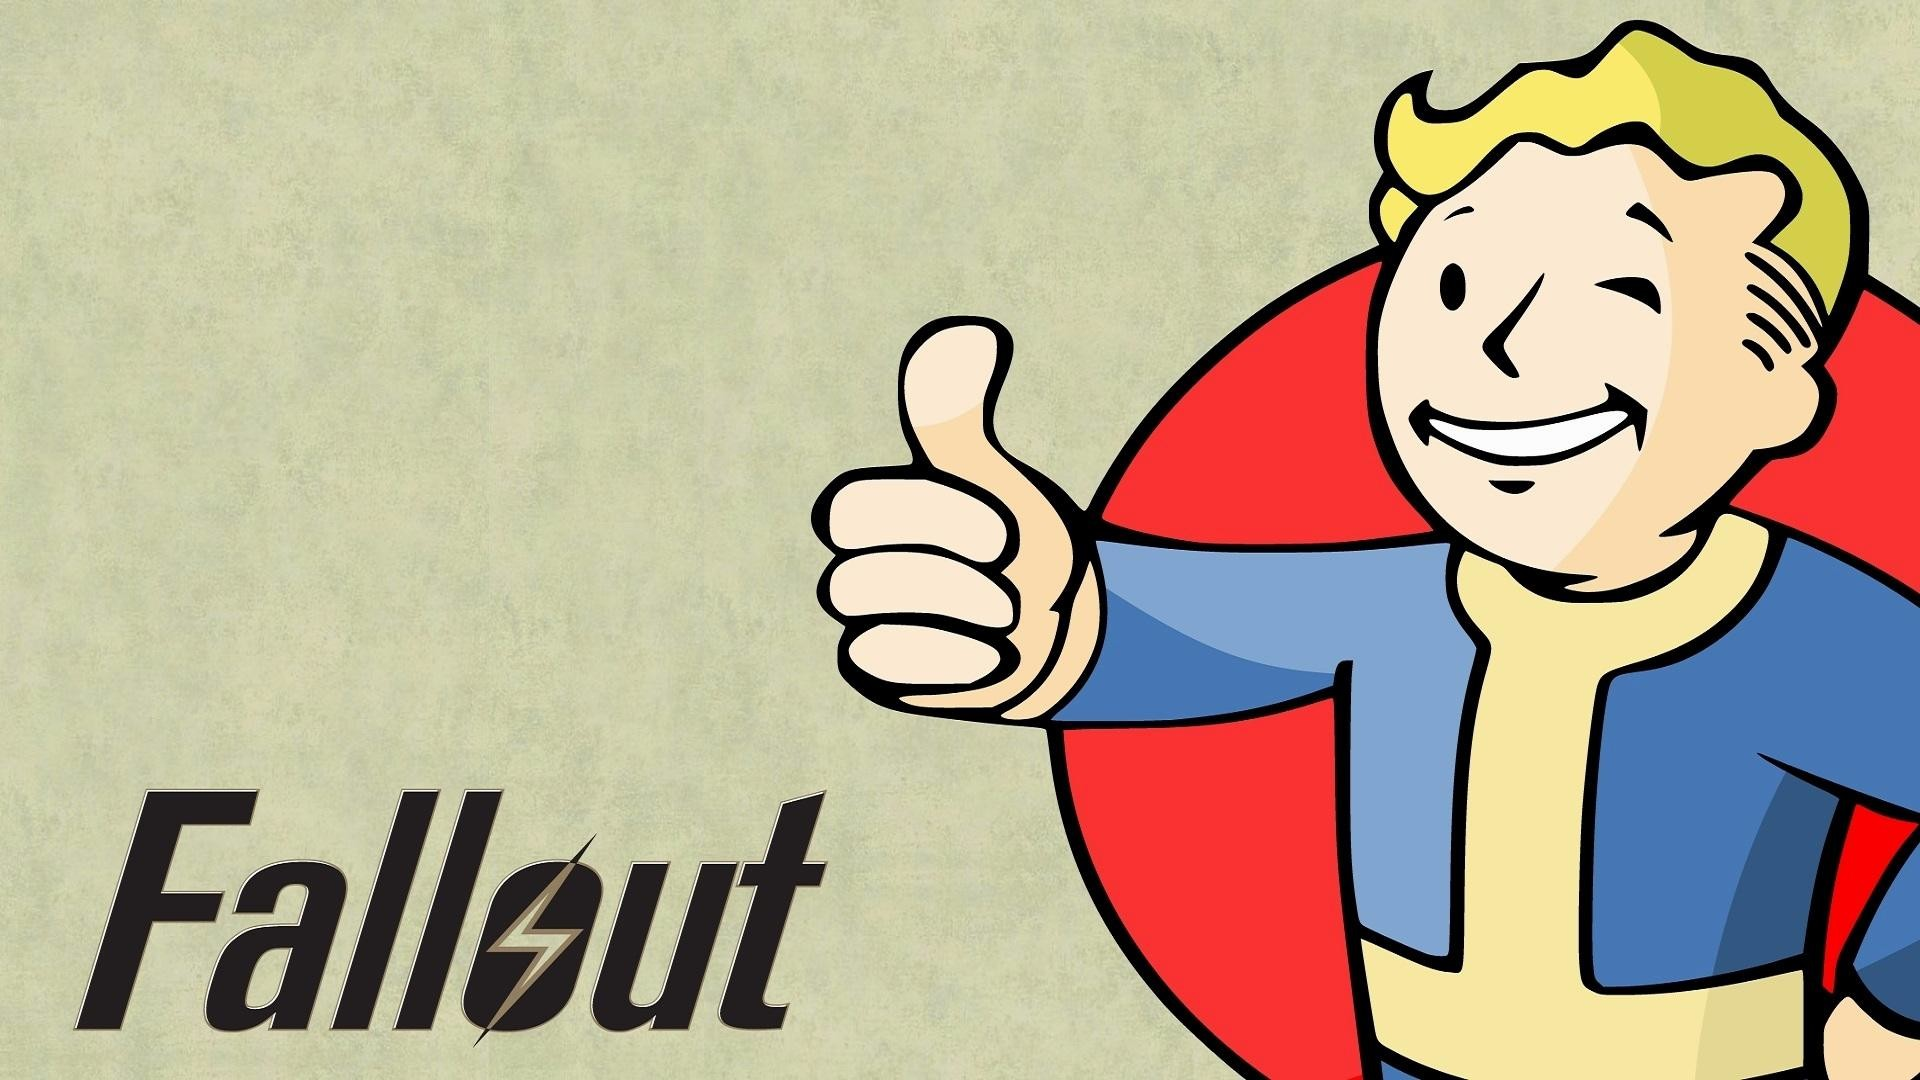 wallpaper.wiki-vault-boy-fallout-game-wallpaper-PIC-